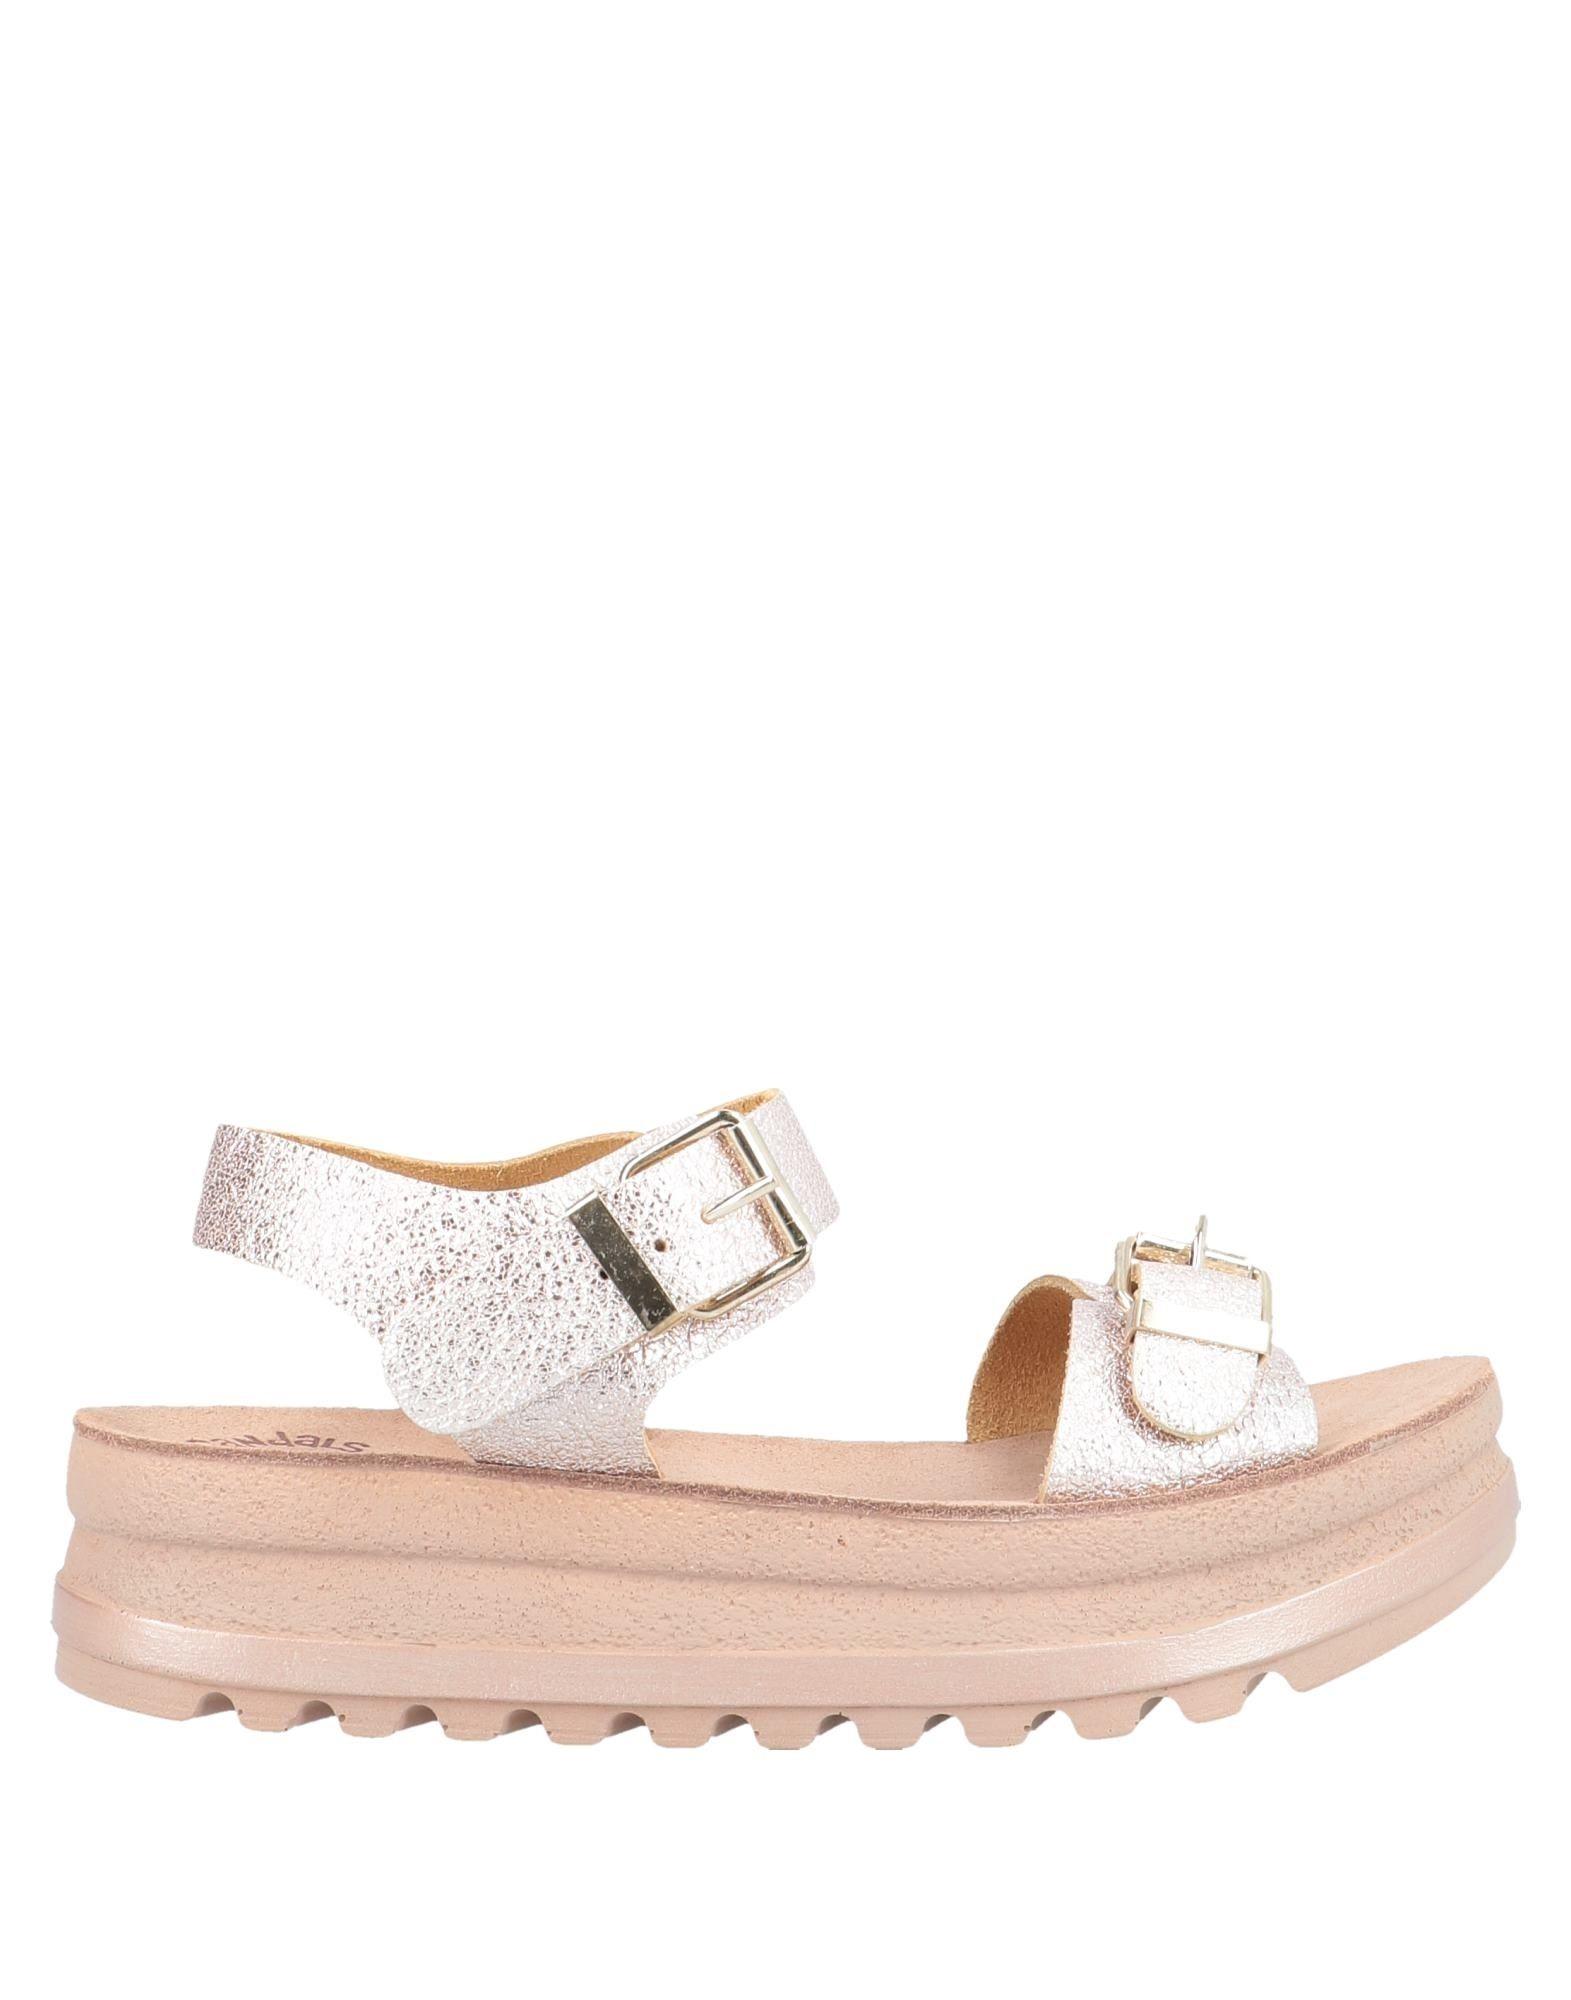 FANTASY SANDALS Сандалии женские сандалии brand women shoes sexy high heels sandals